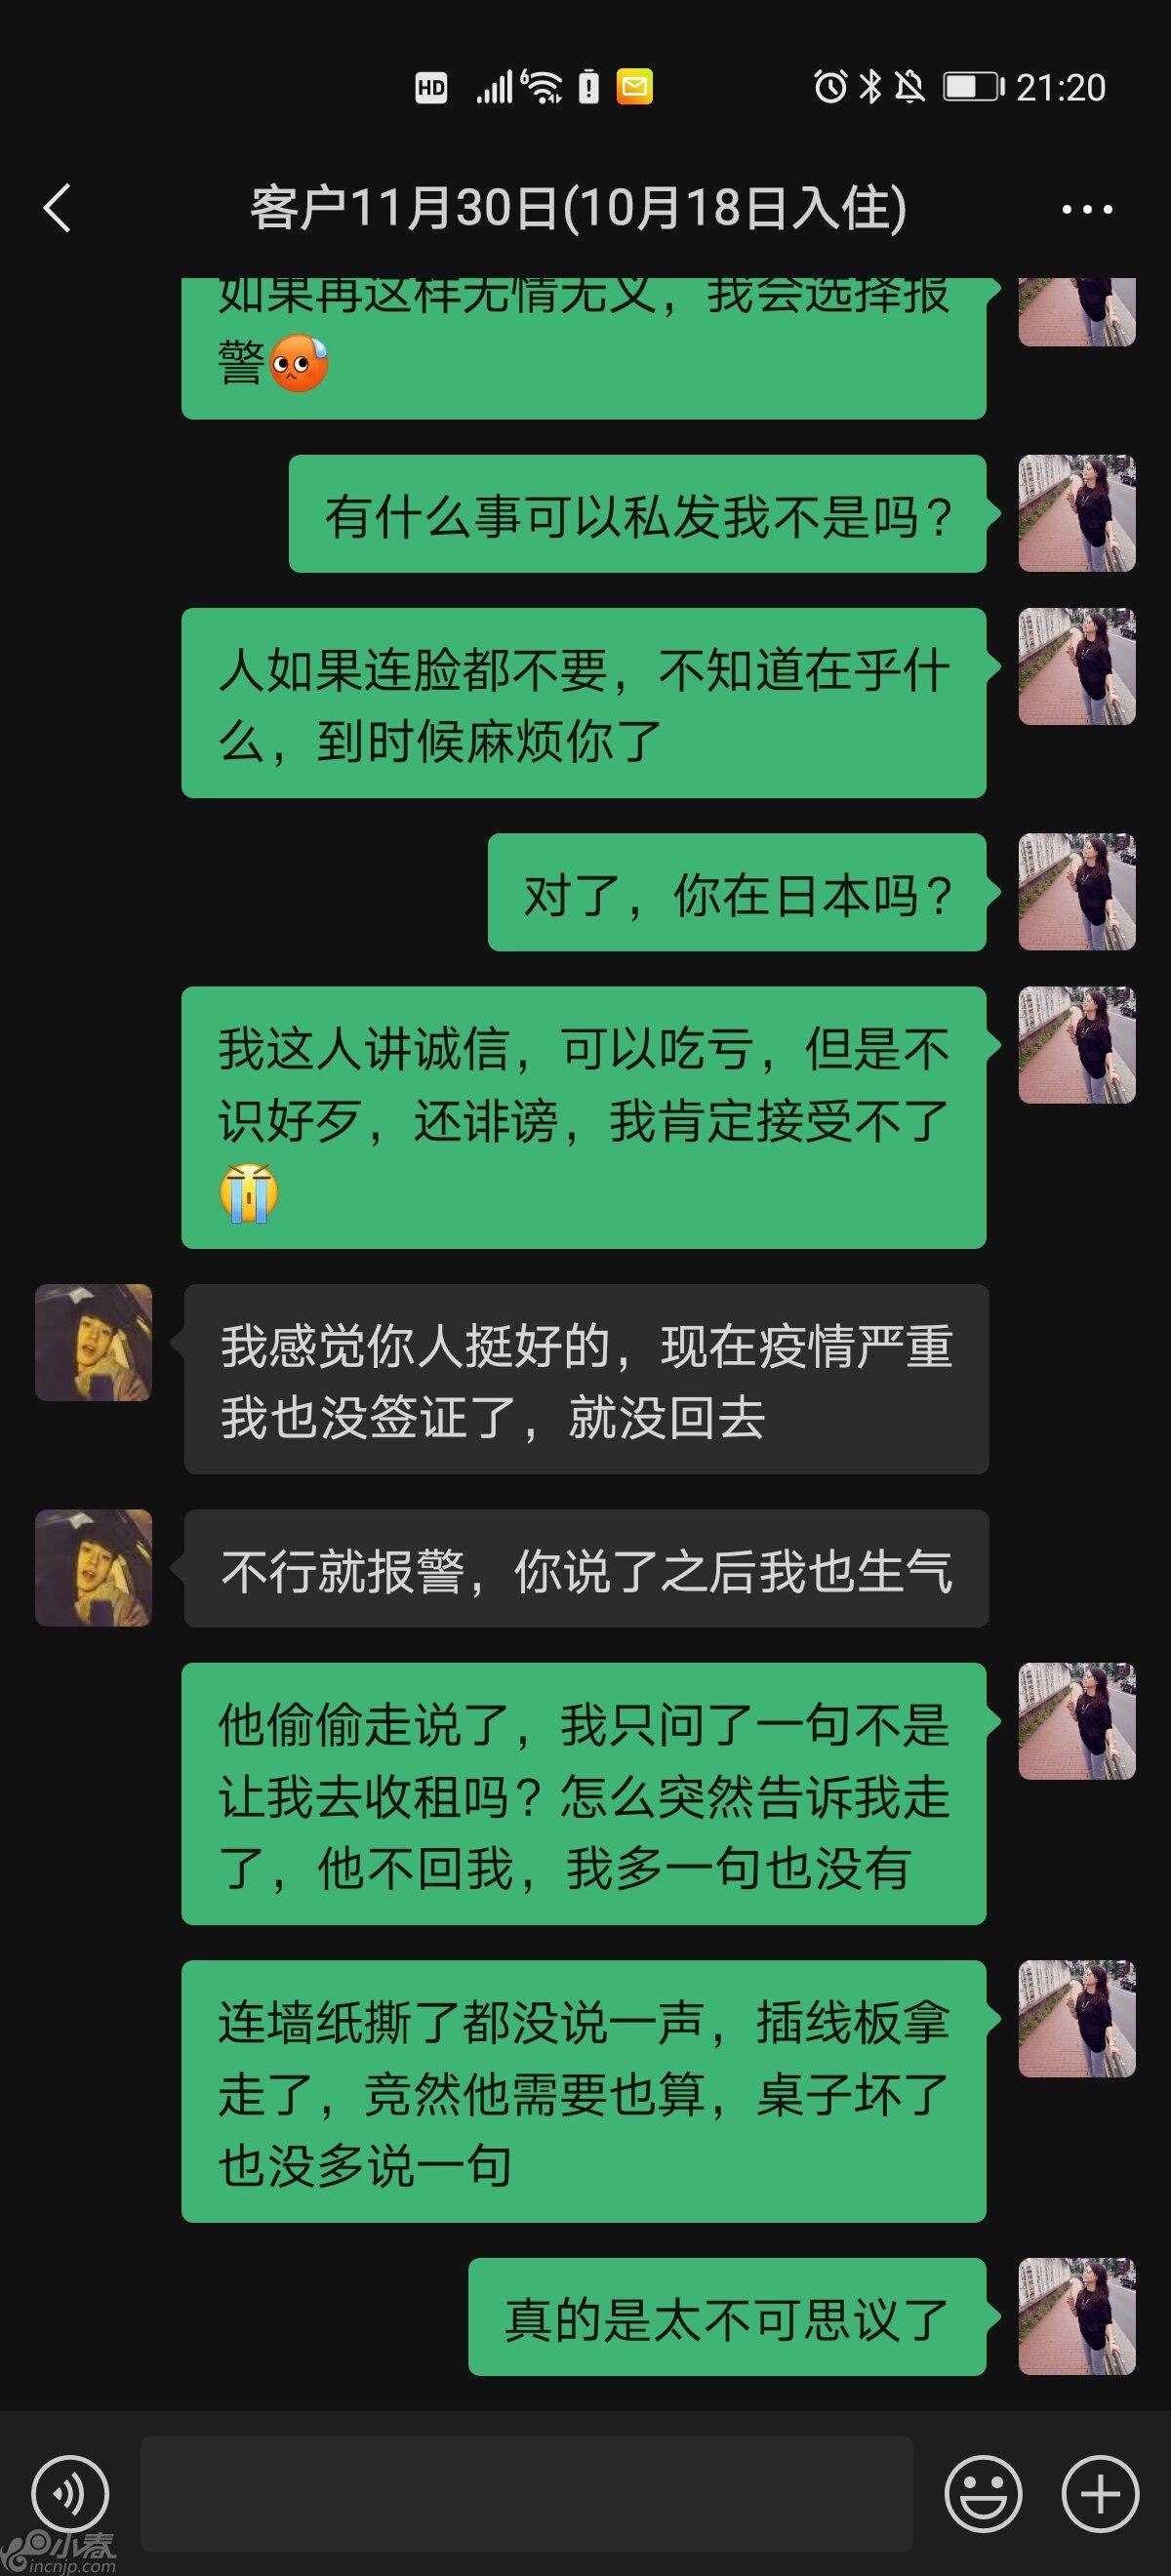 Screenshot_20210721_212031_com.tencent.mm.jpg